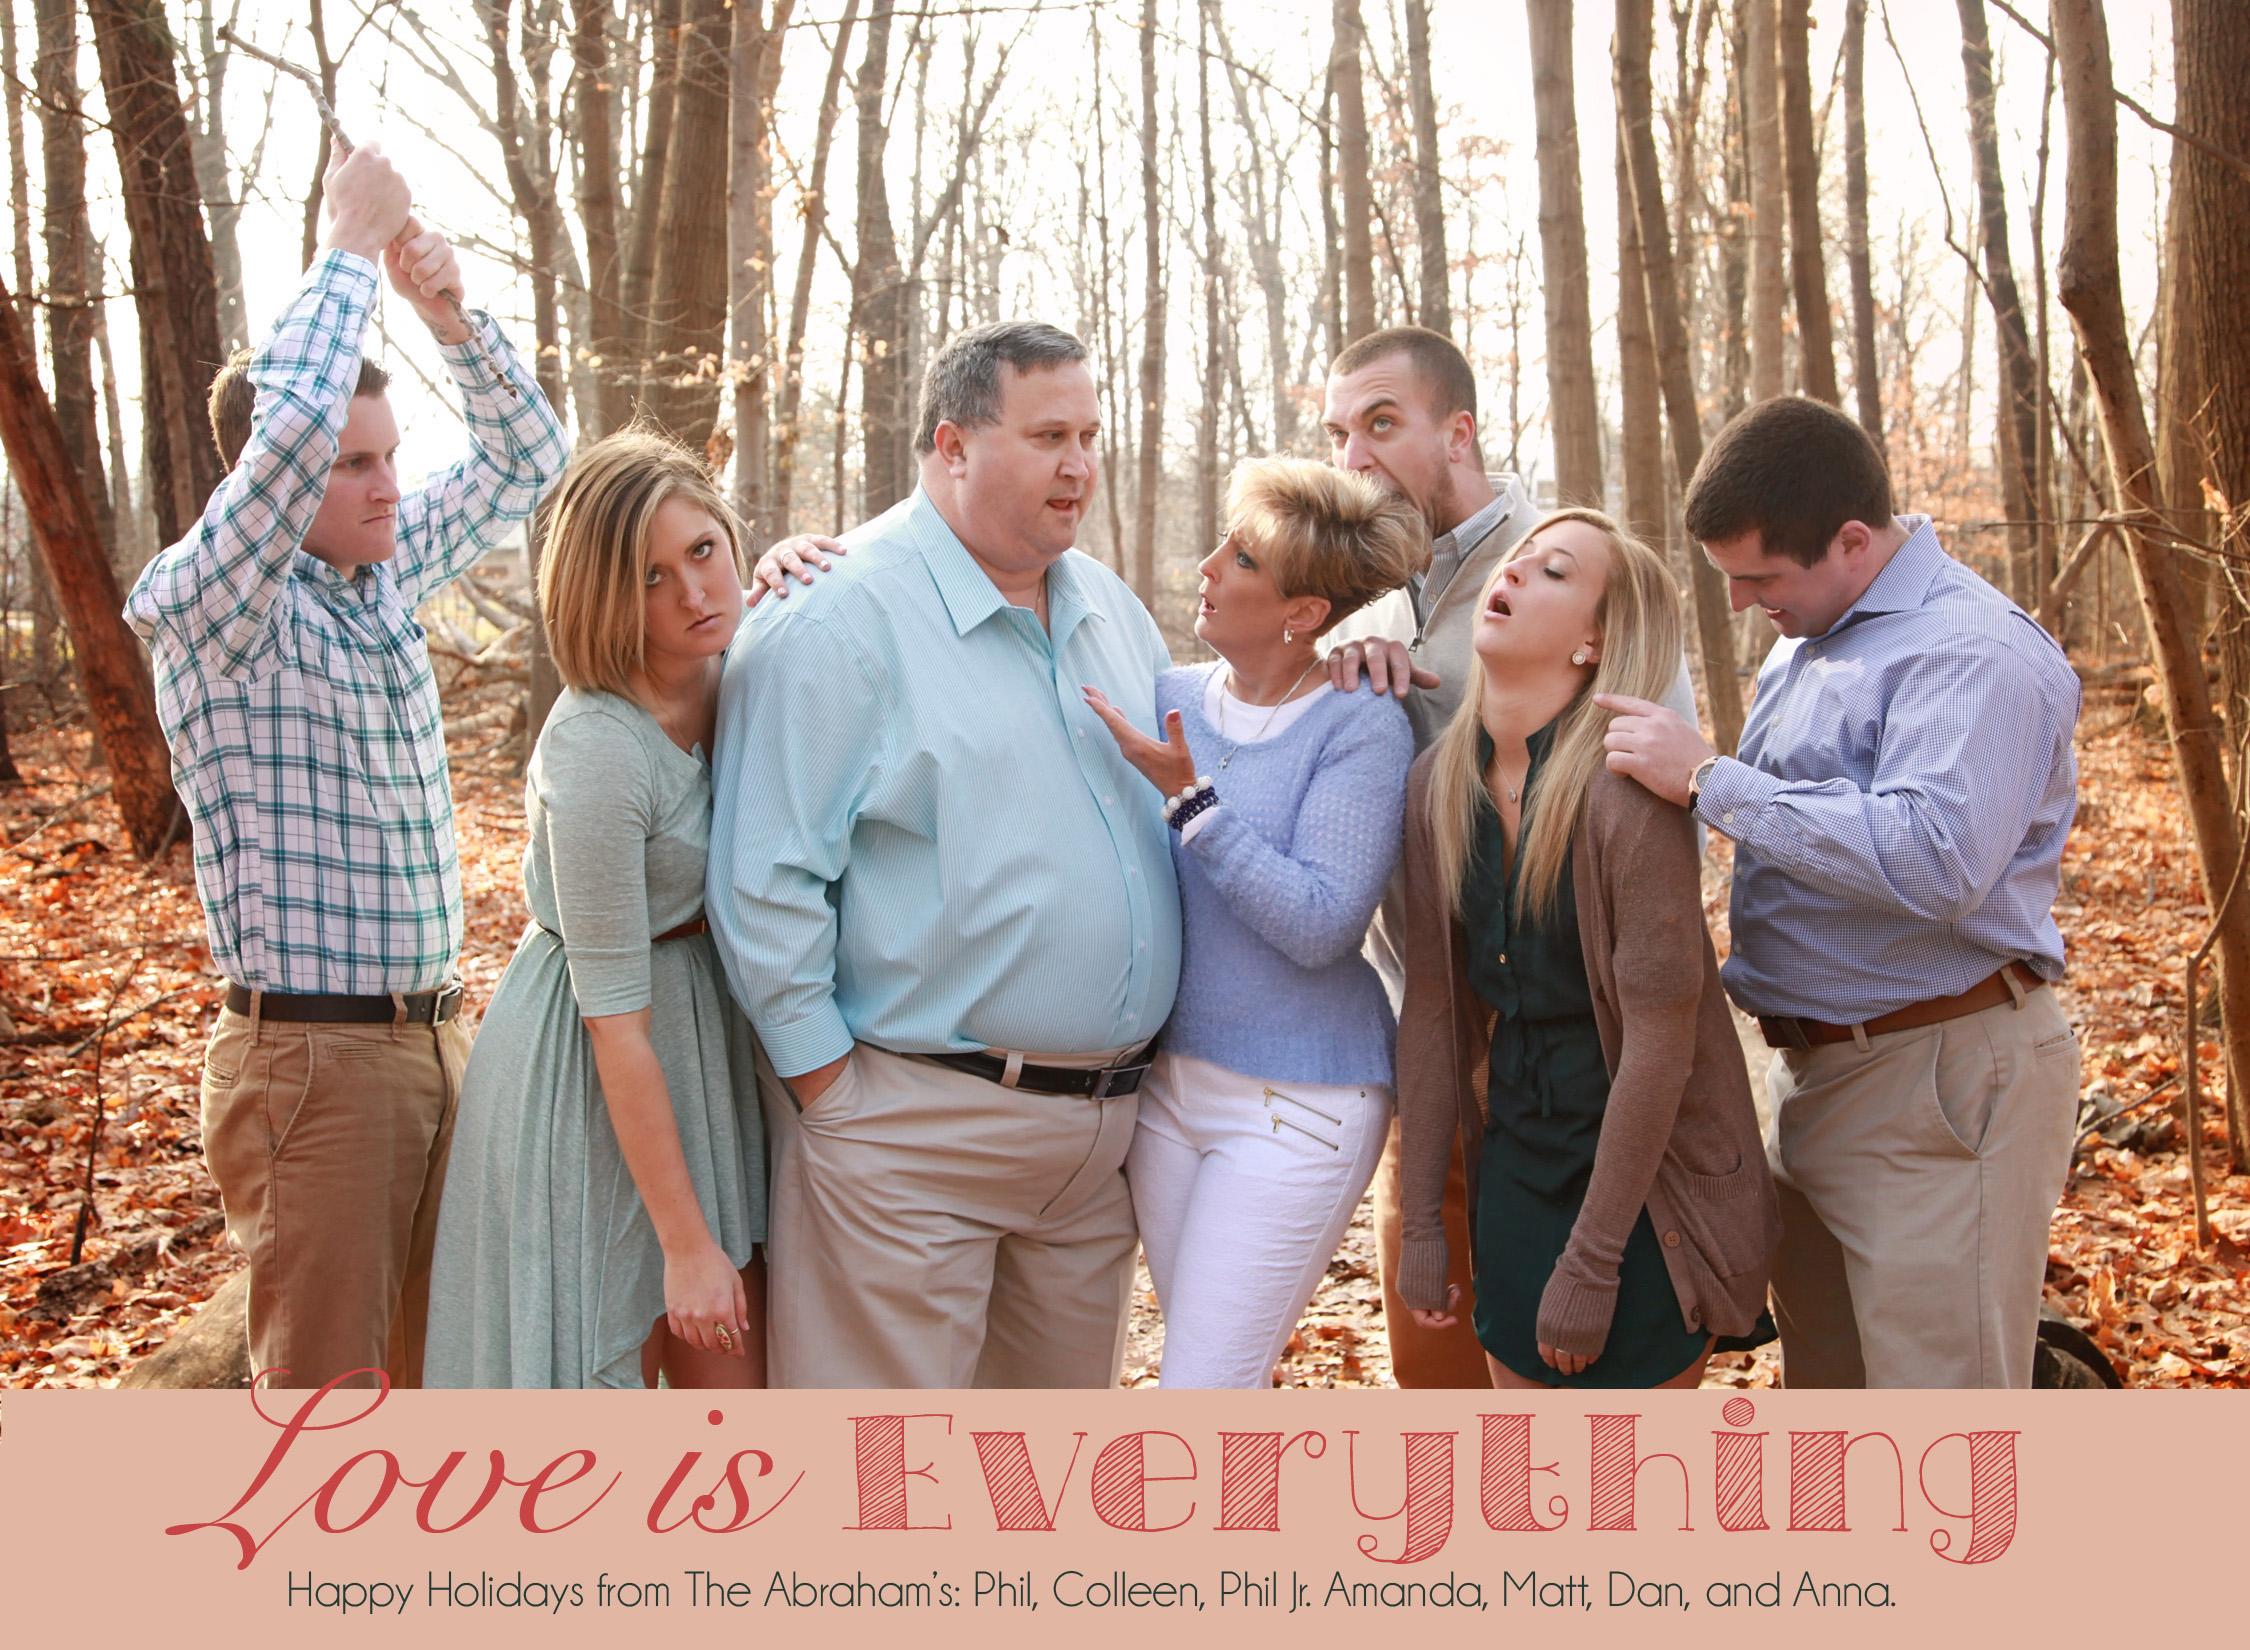 Family Photo Christmas Card Ideas Pinterest 15 Funny S